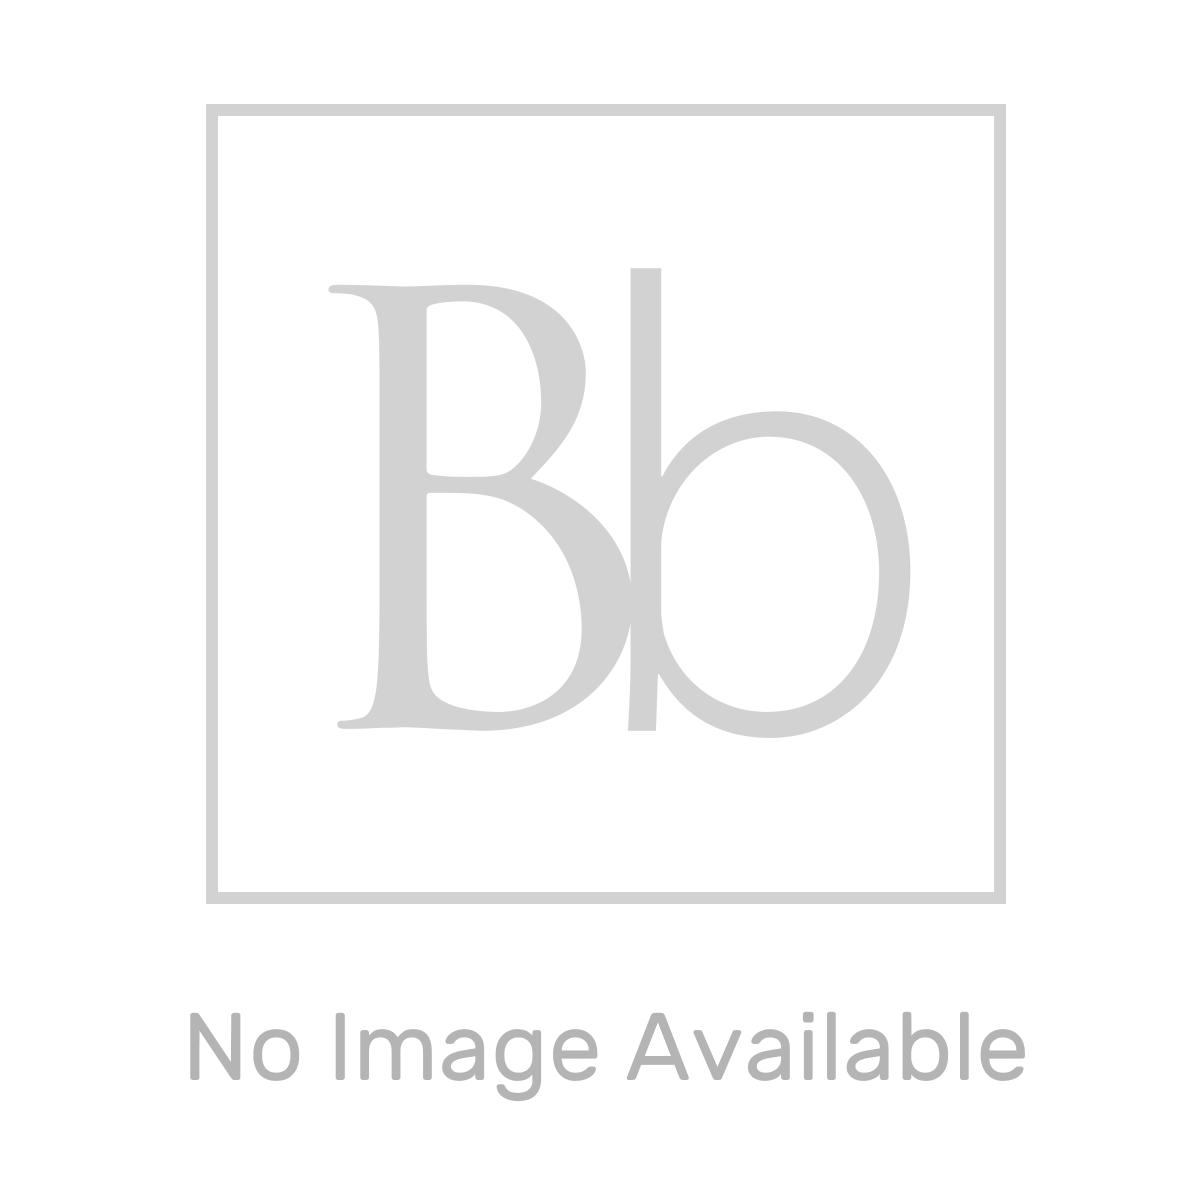 Aquadart Black Slate Shower Tray 1700 x 800 Lifestyle